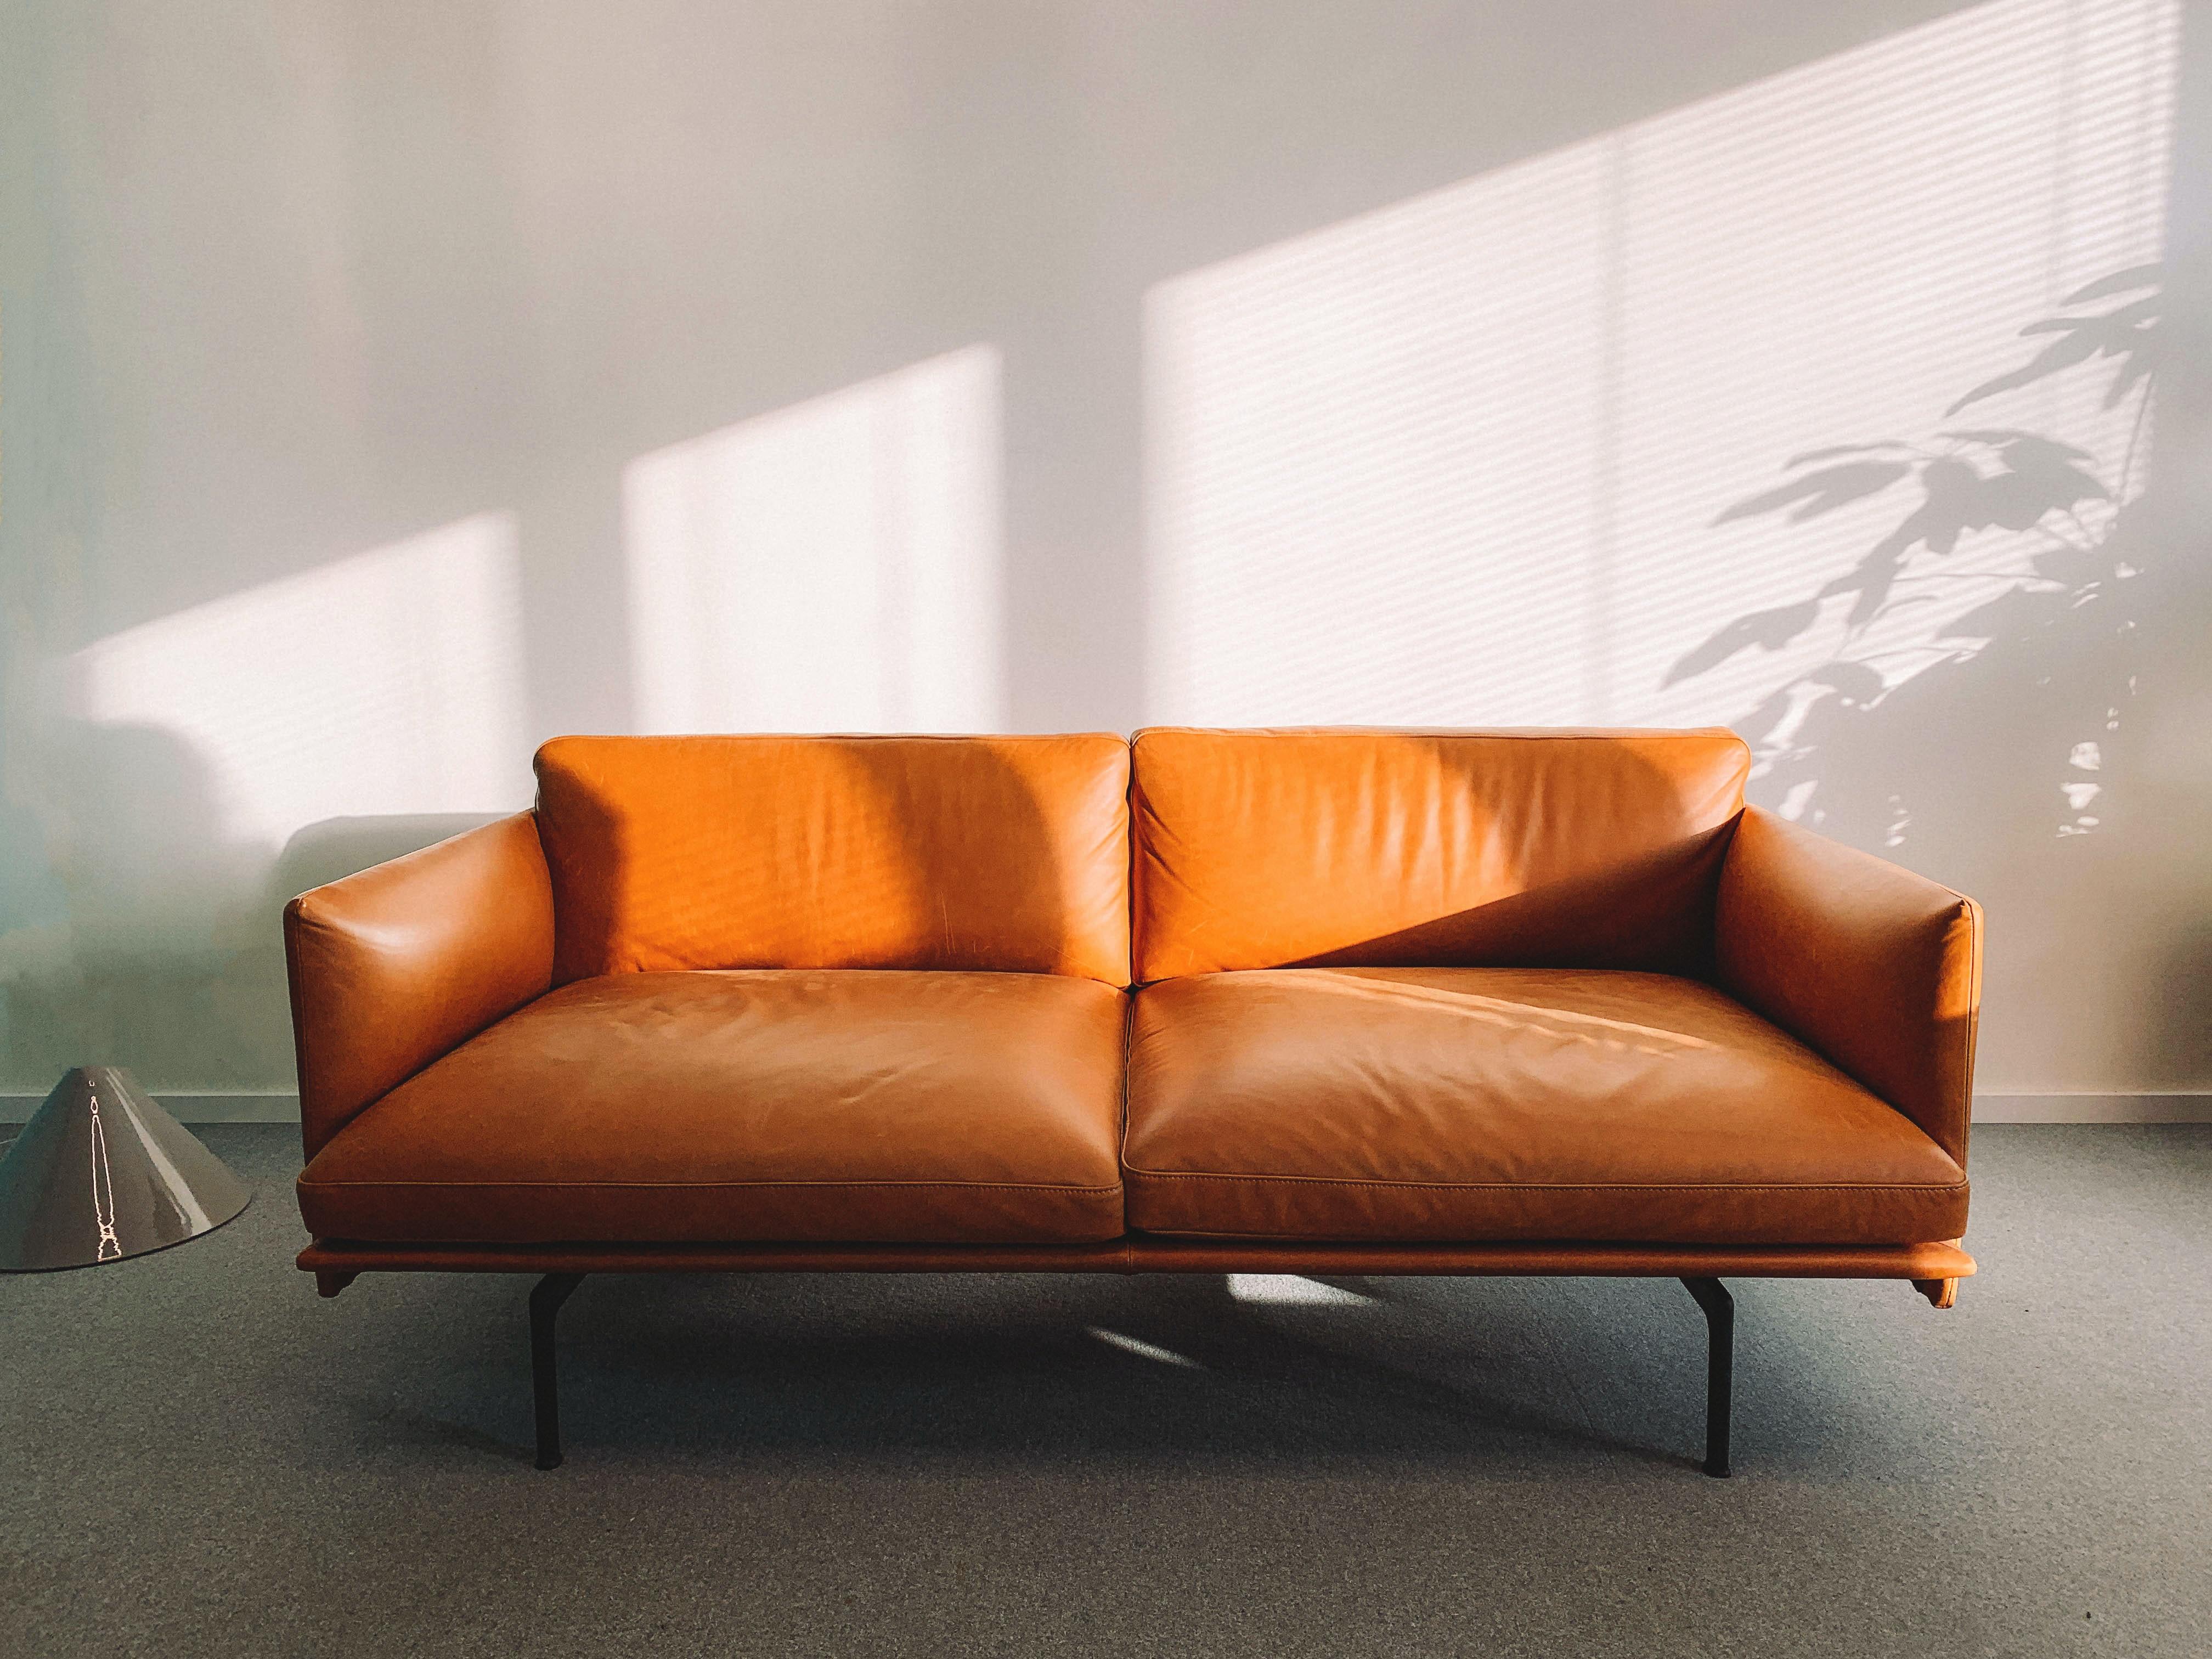 Surprising 2 Seat Orange Leather Sofa Beside Wall Free Stock Photo Spiritservingveterans Wood Chair Design Ideas Spiritservingveteransorg